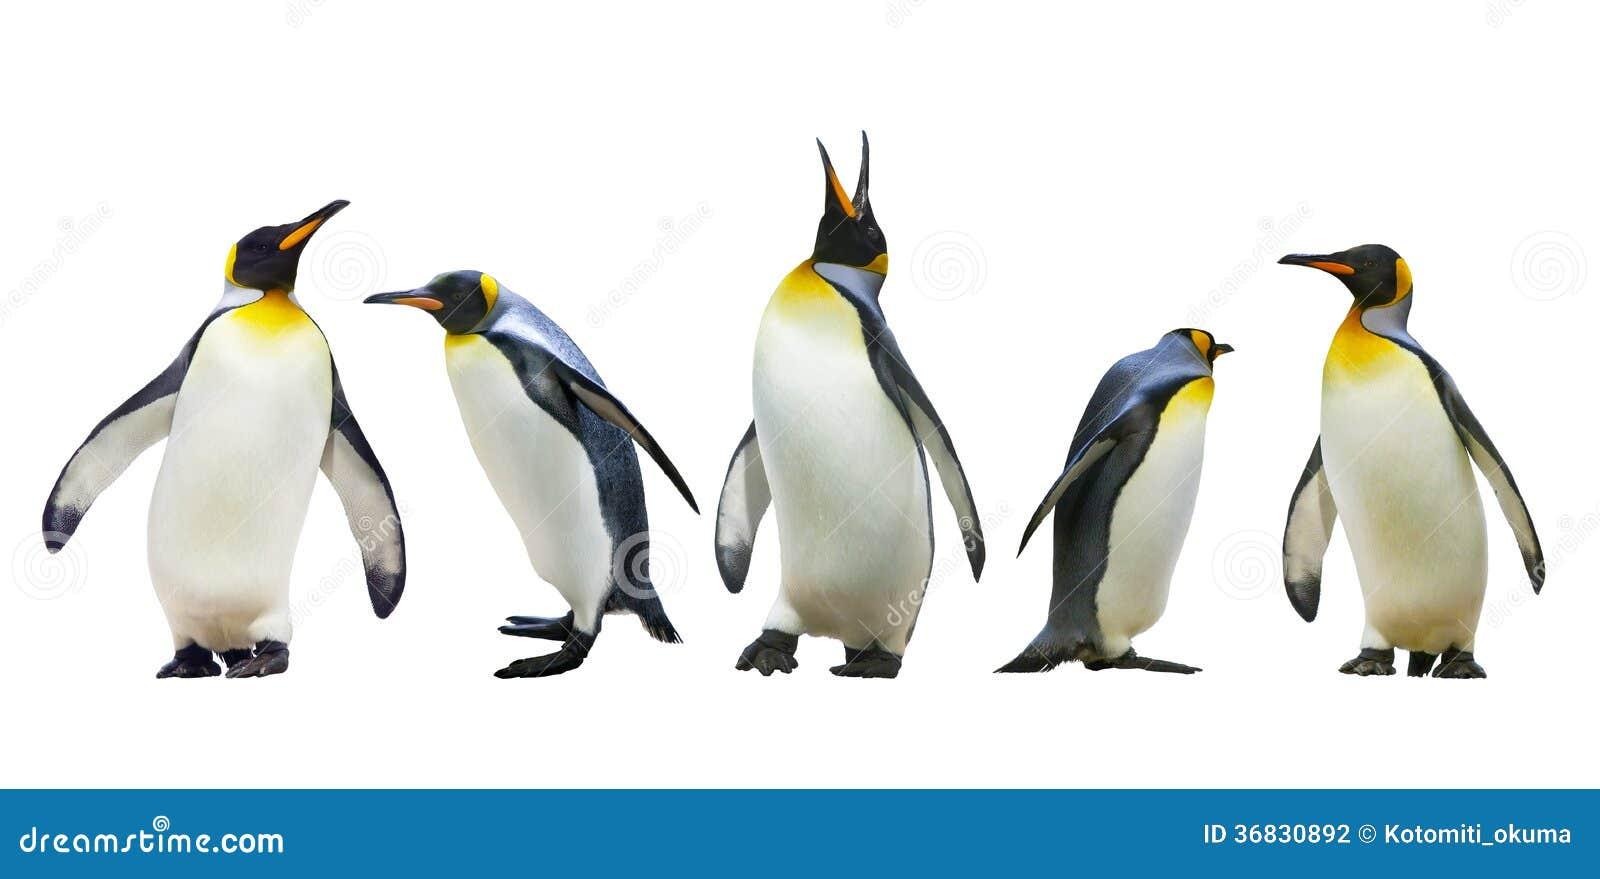 penguins of madagascar christmas wallpaper